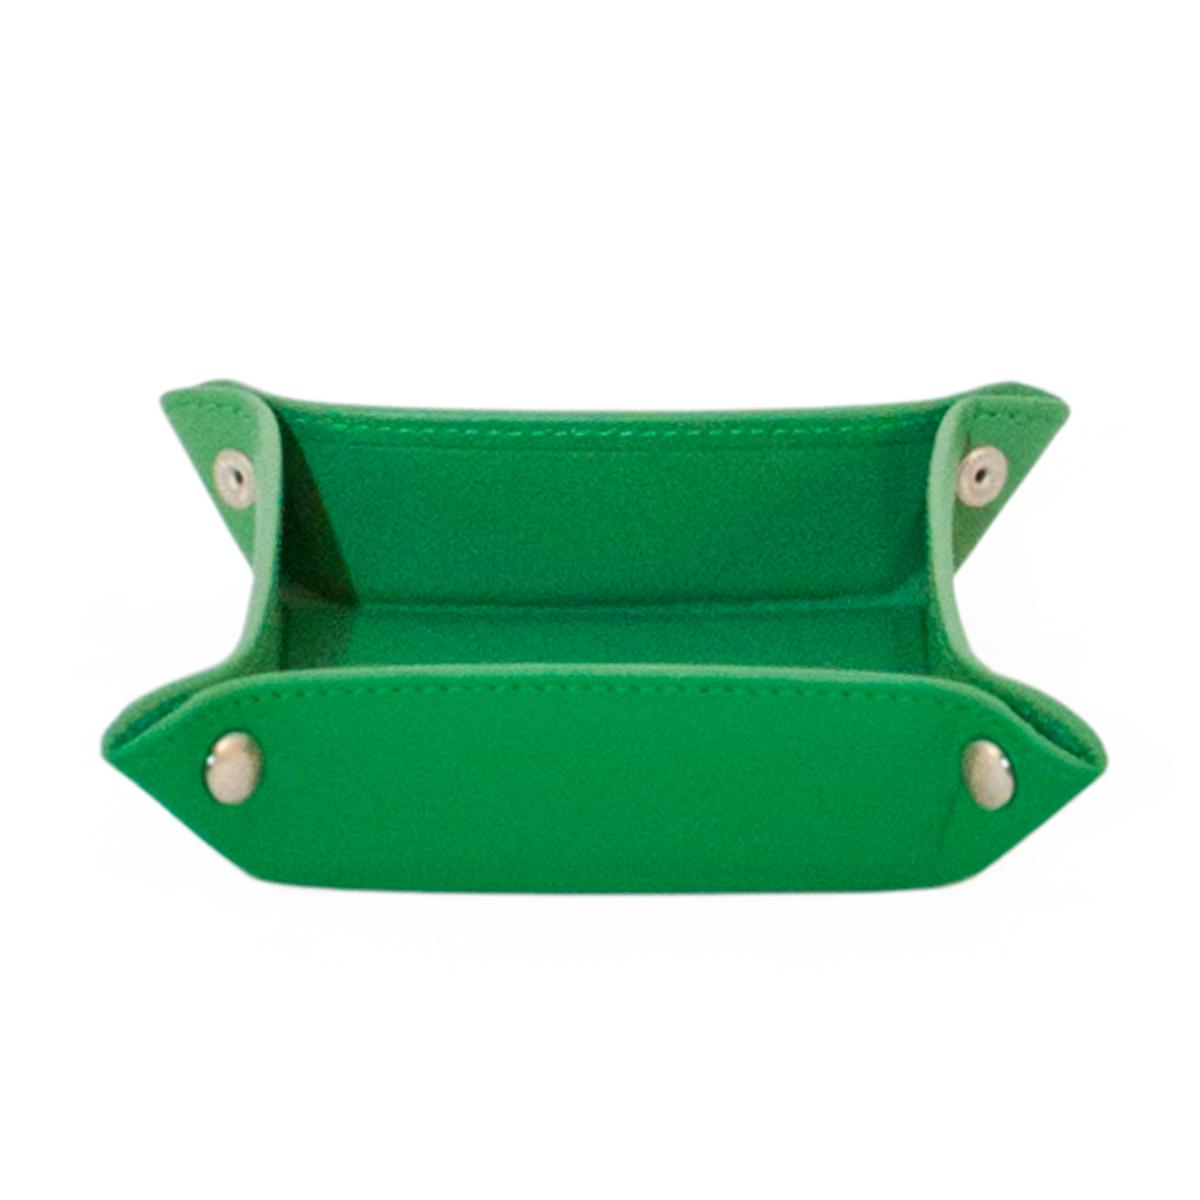 Jewellery Tray Green